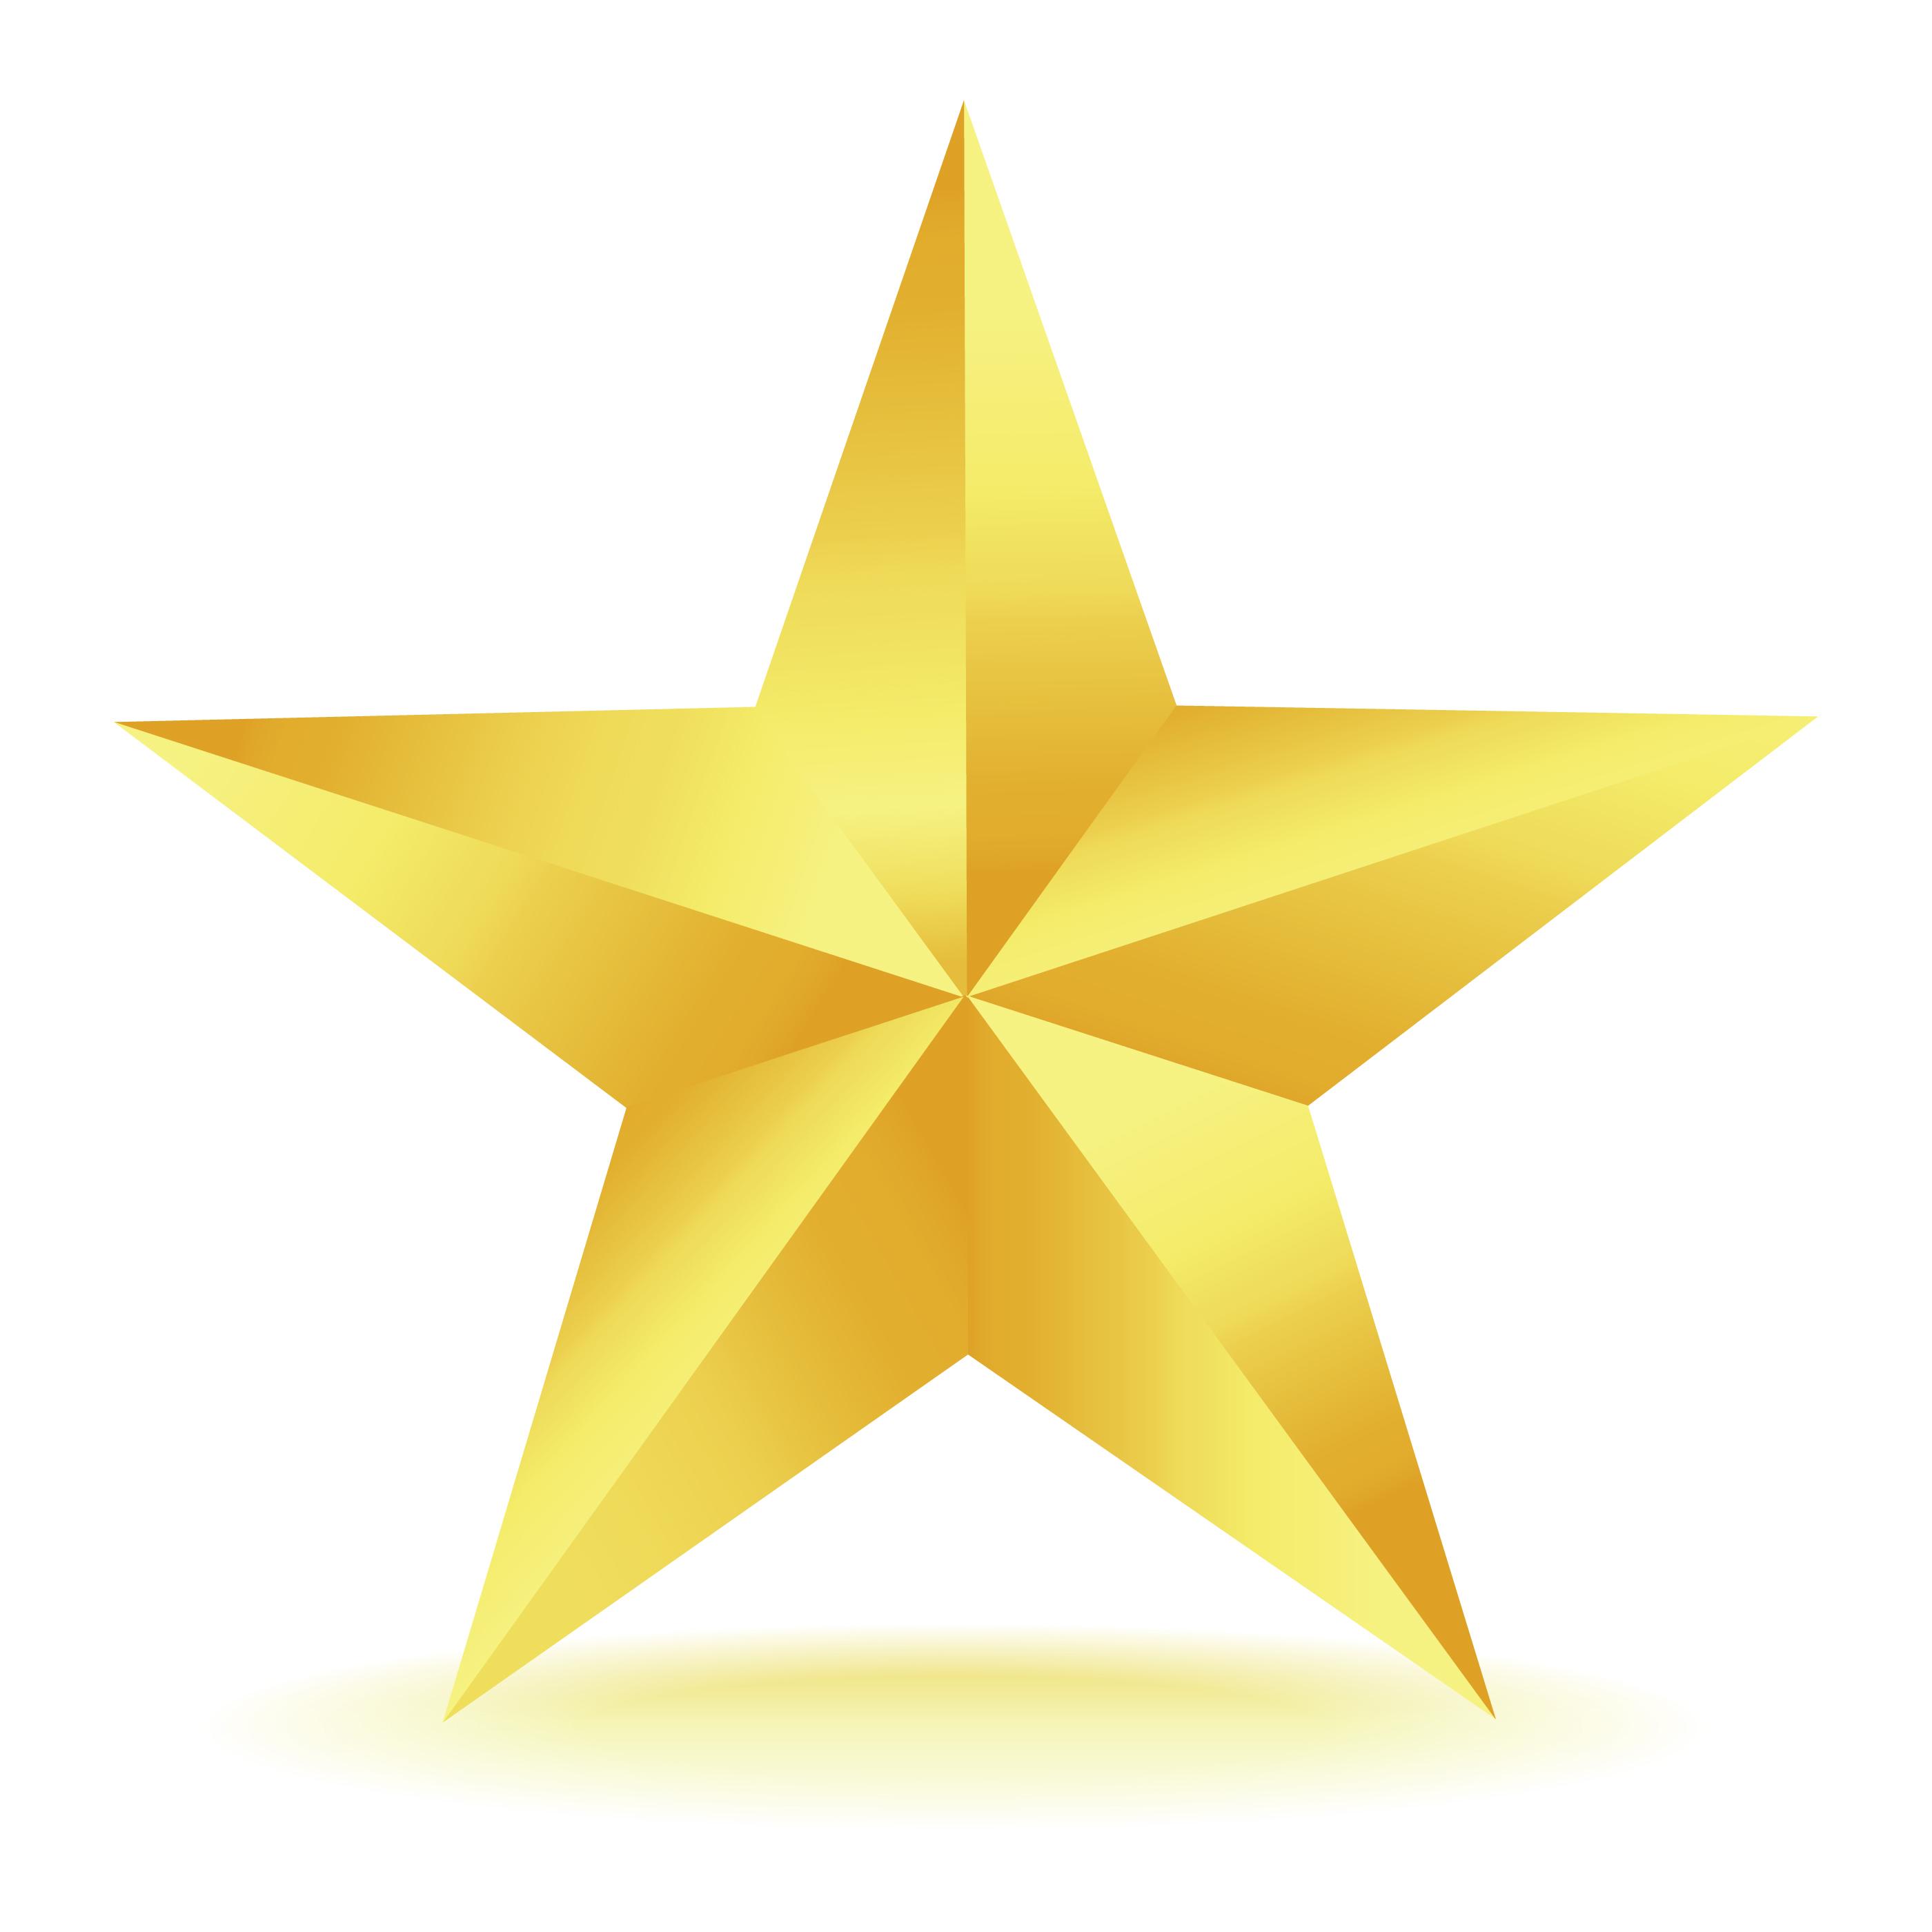 Stars Clipart - Clipart Kid